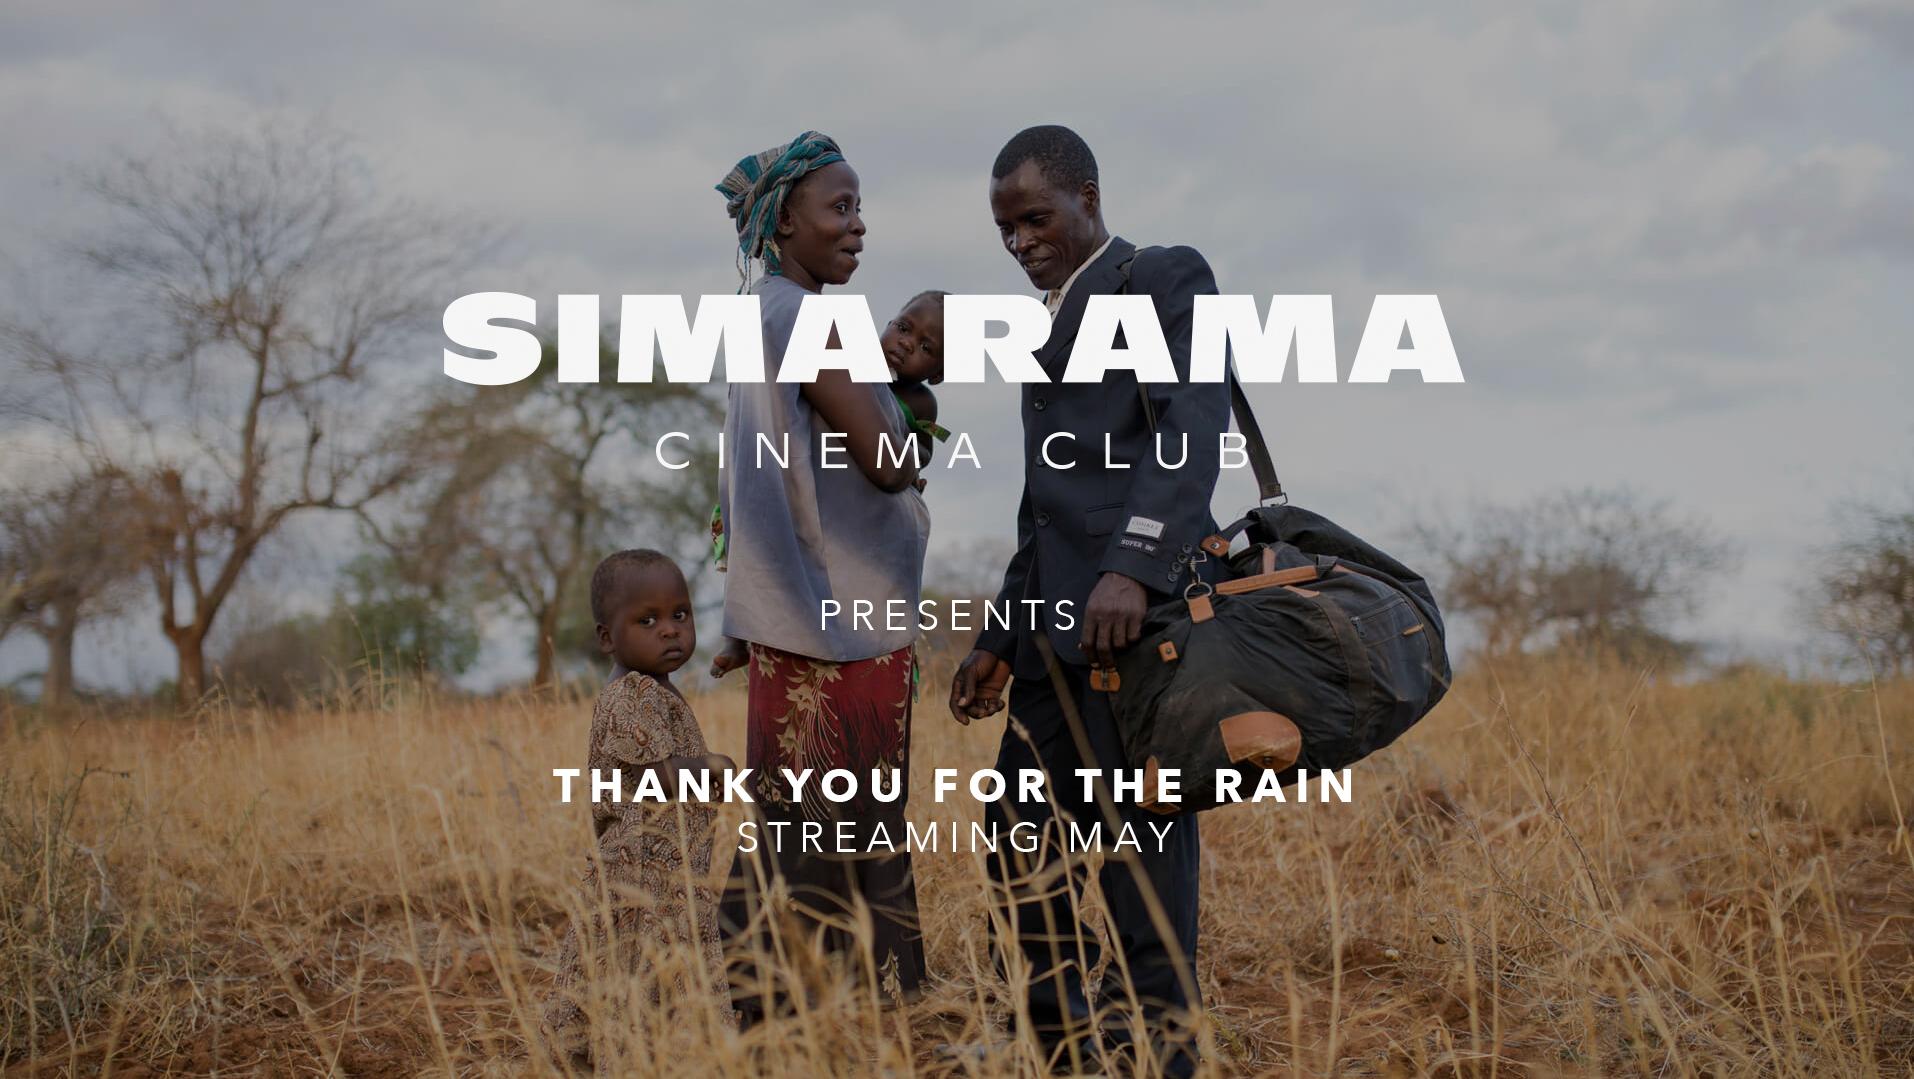 sima-rama-FB-EVENT_Thank-you-for-the-rain-1.jpg